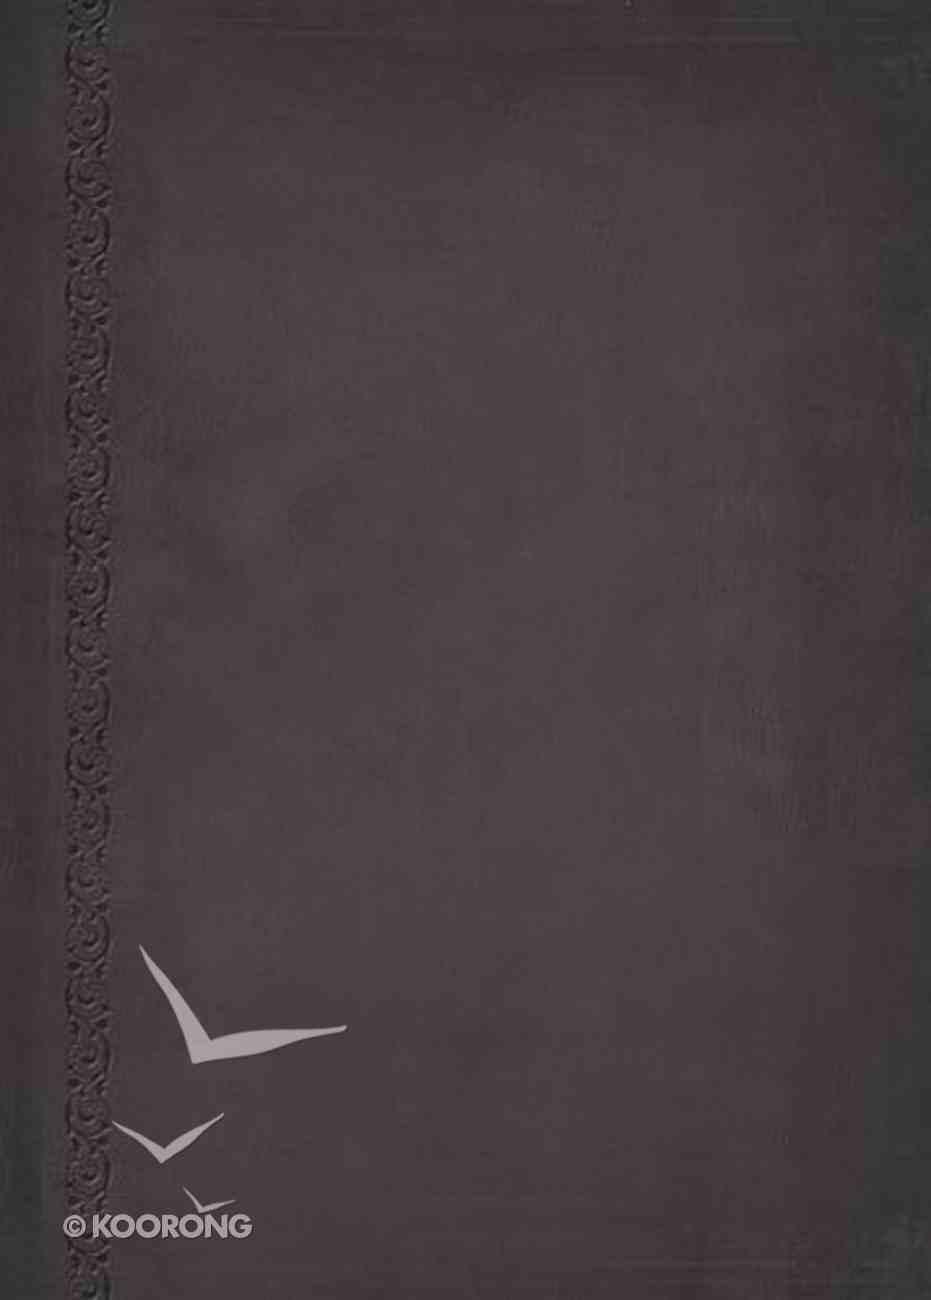 NKJV Macarthur Study Bible Signature Series Black Indexed (Black Letter Edition) Premium Imitation Leather